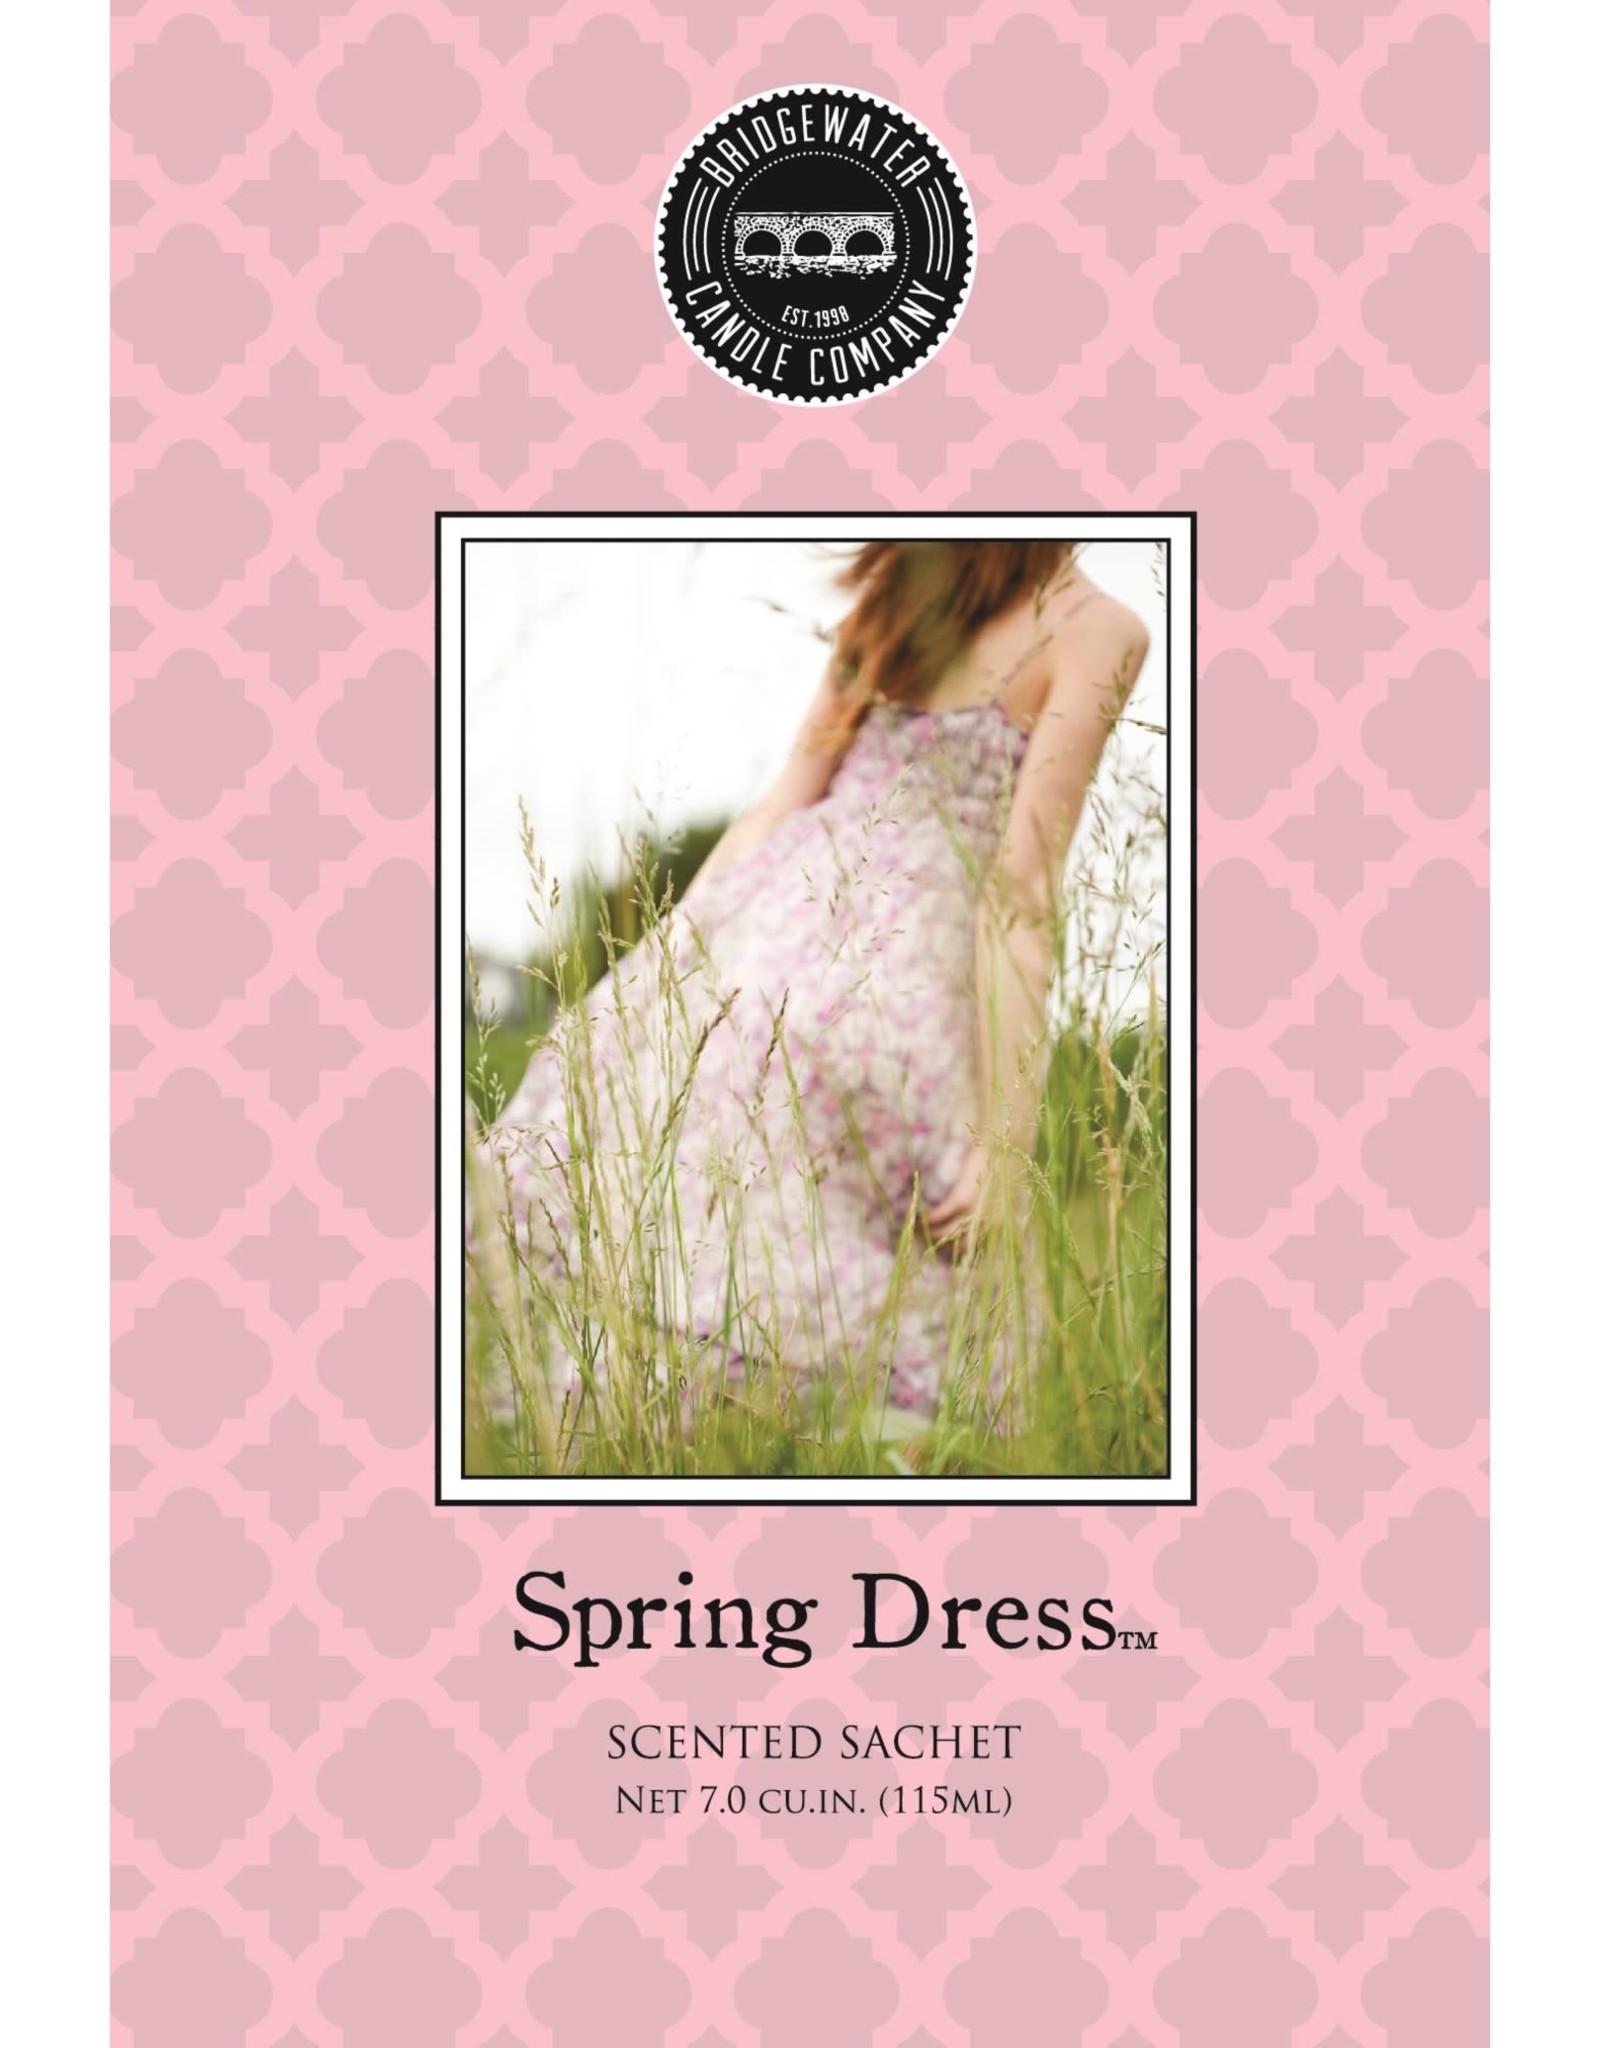 Parfum spring dress sac rose pâle